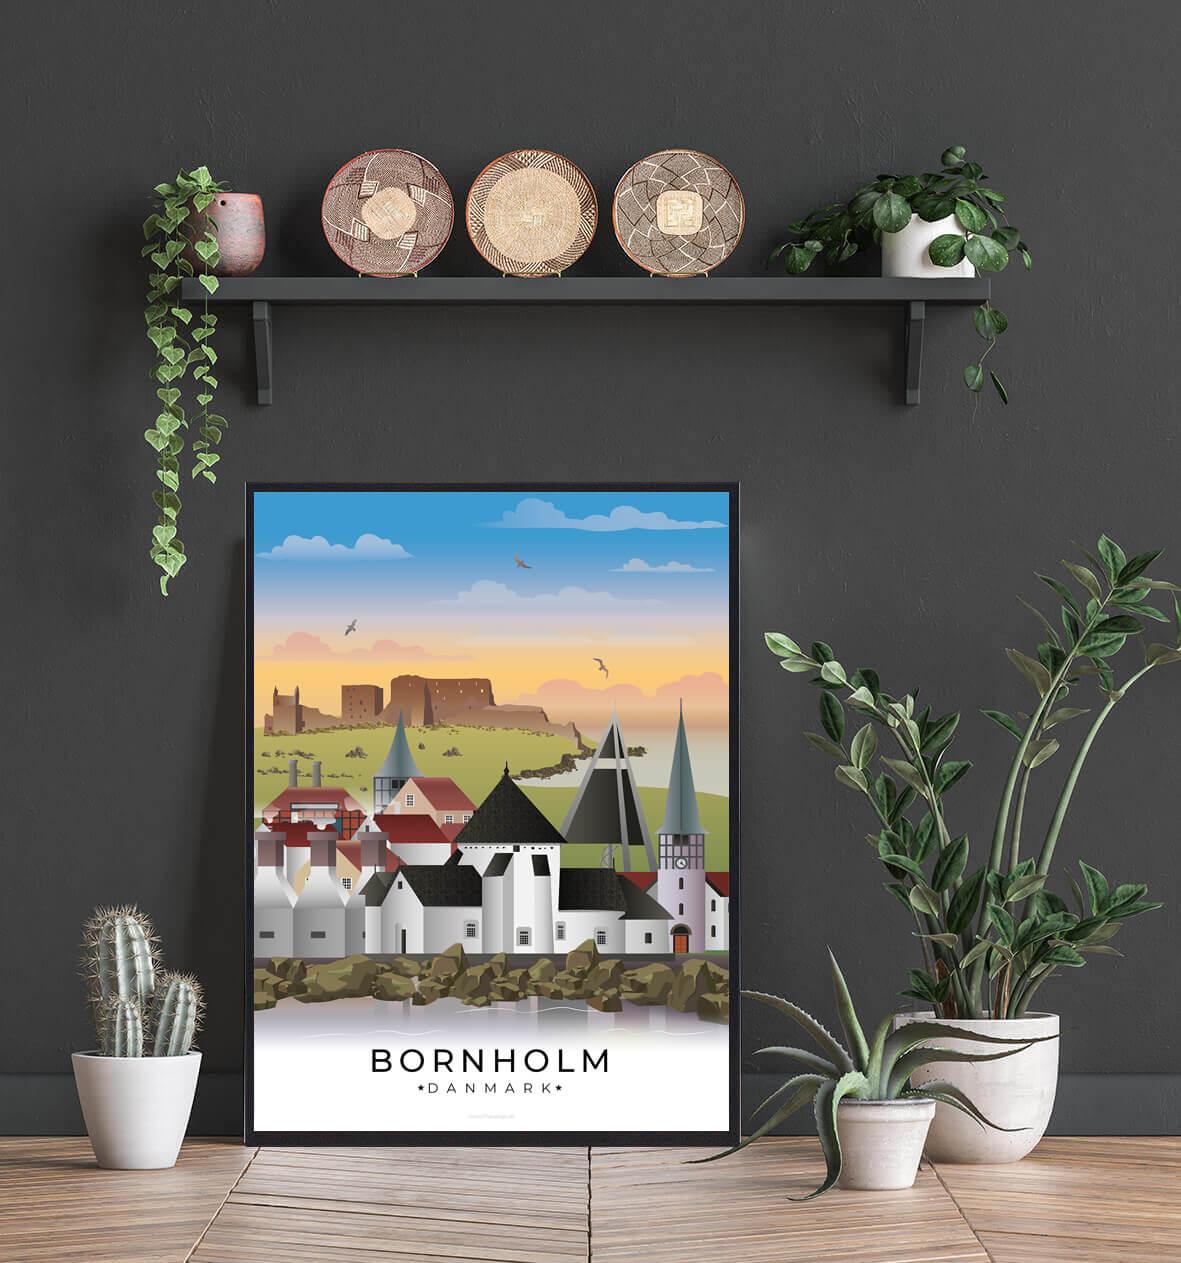 Bornholm-byplakat-2